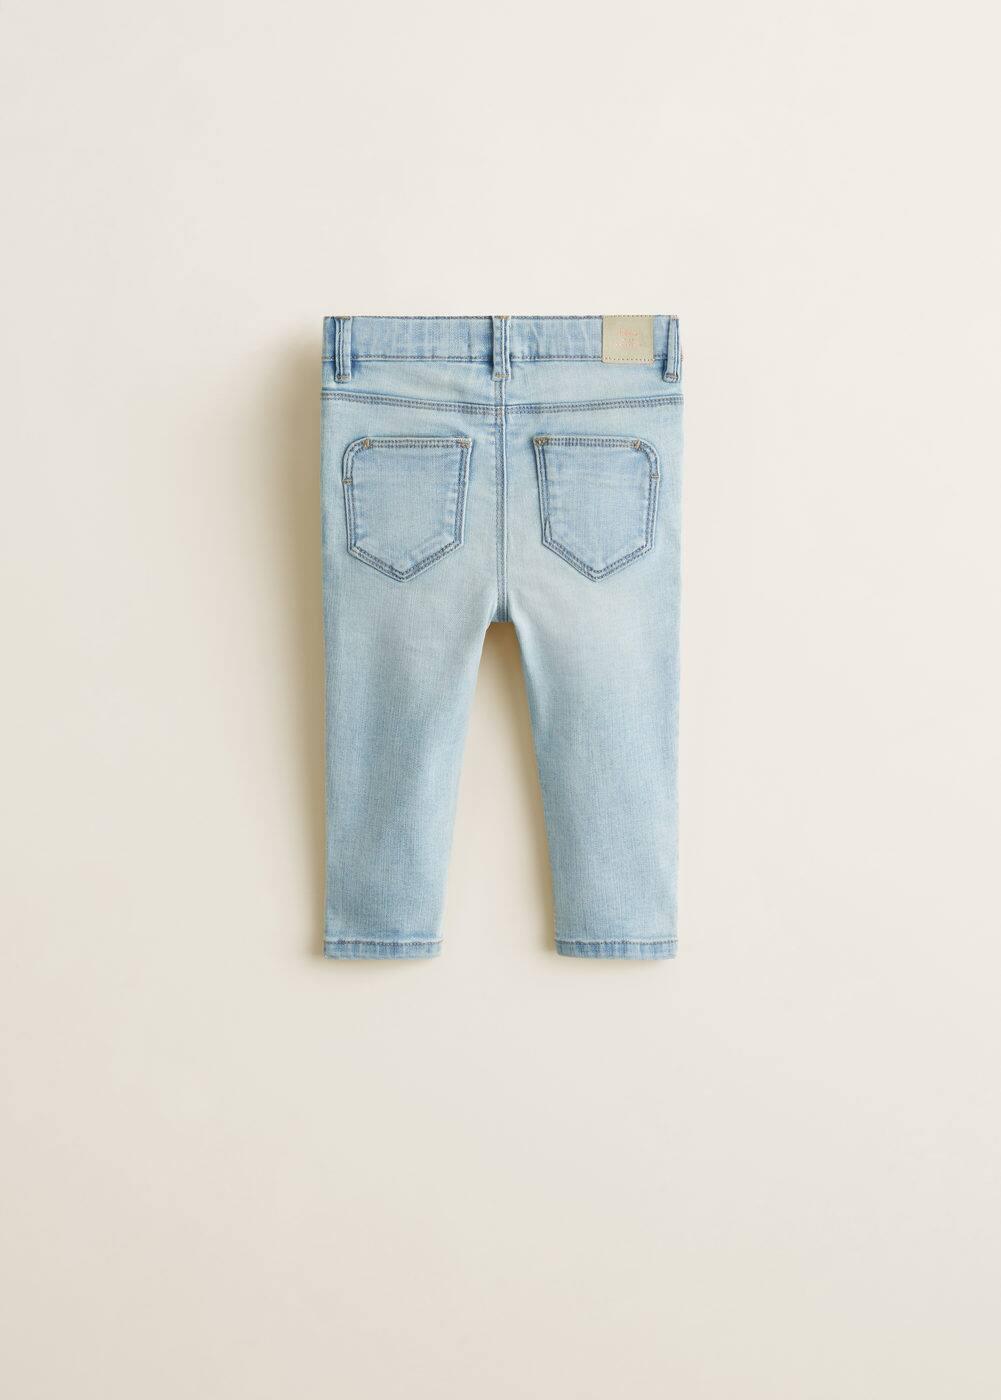 Mango - Slim Fit Jeans - 2